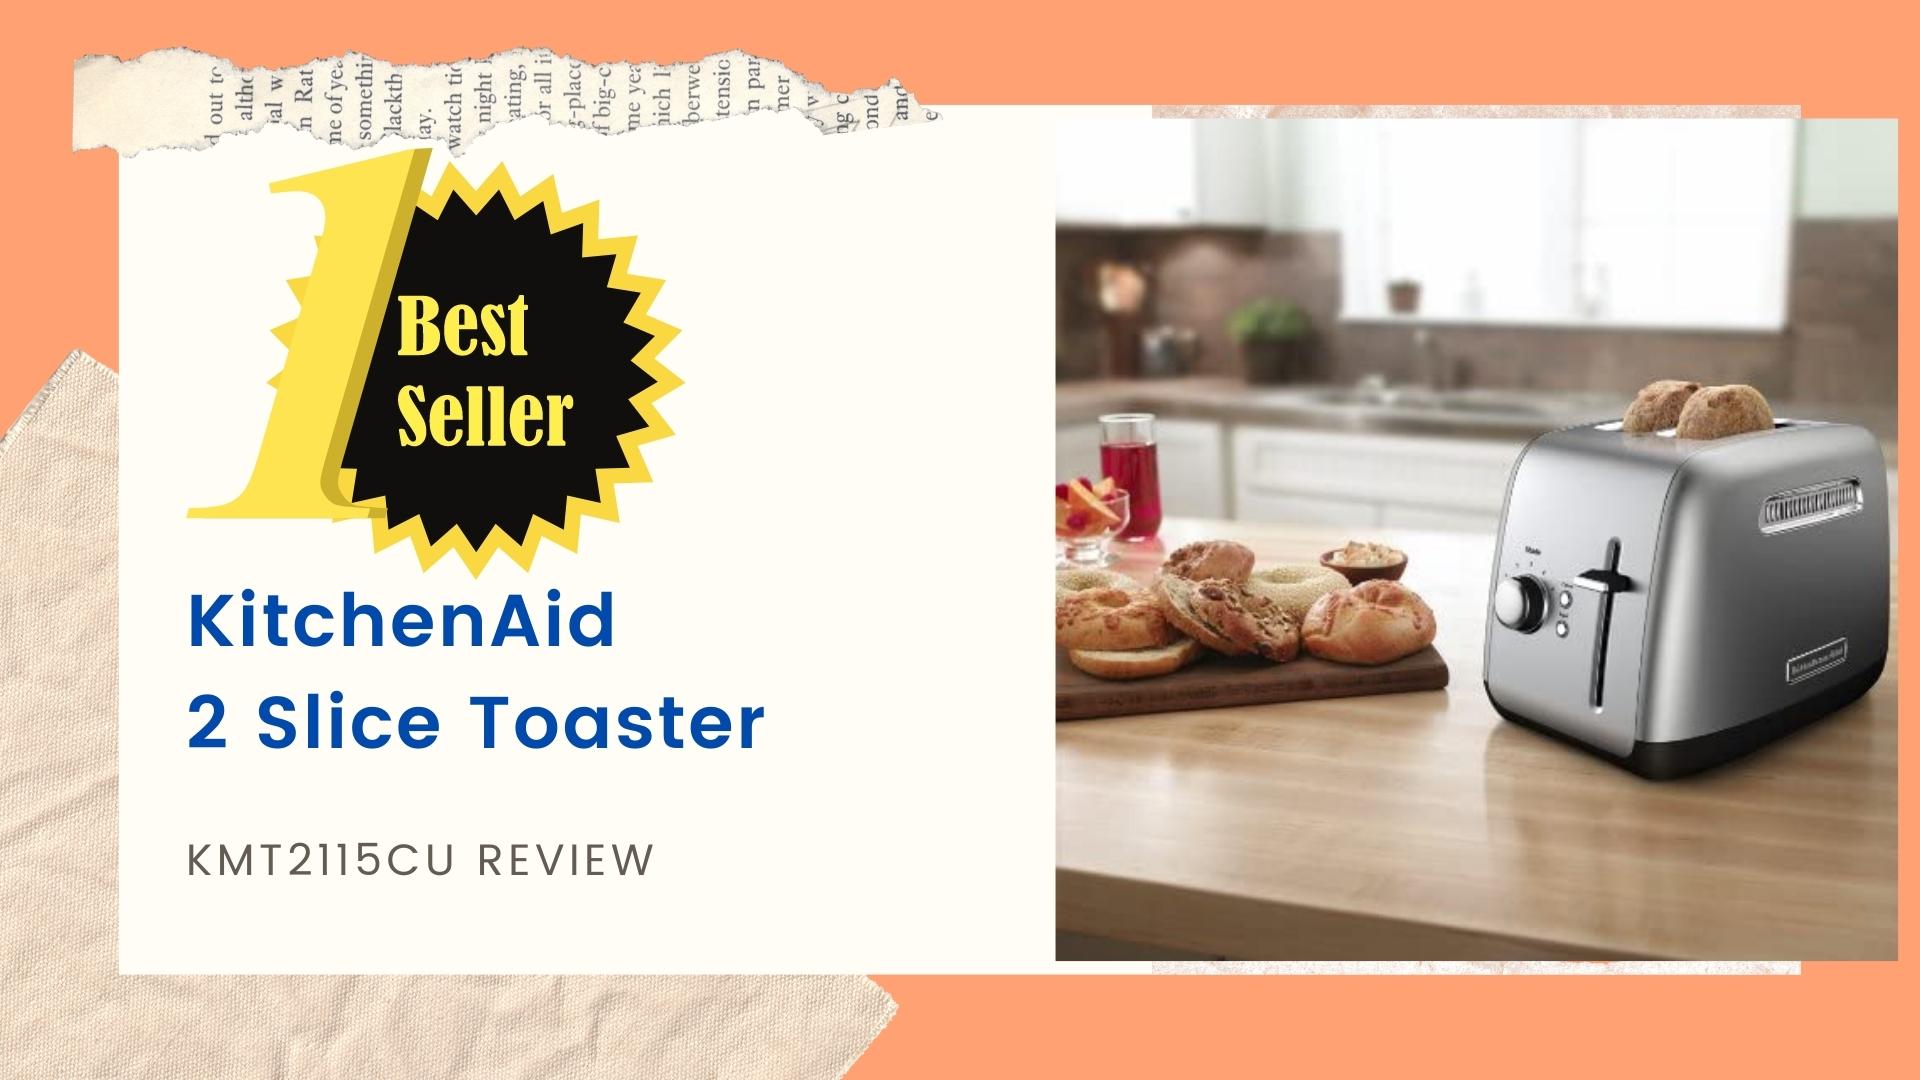 KitchenAid 2 Slice Toaster KMT2115CU Review